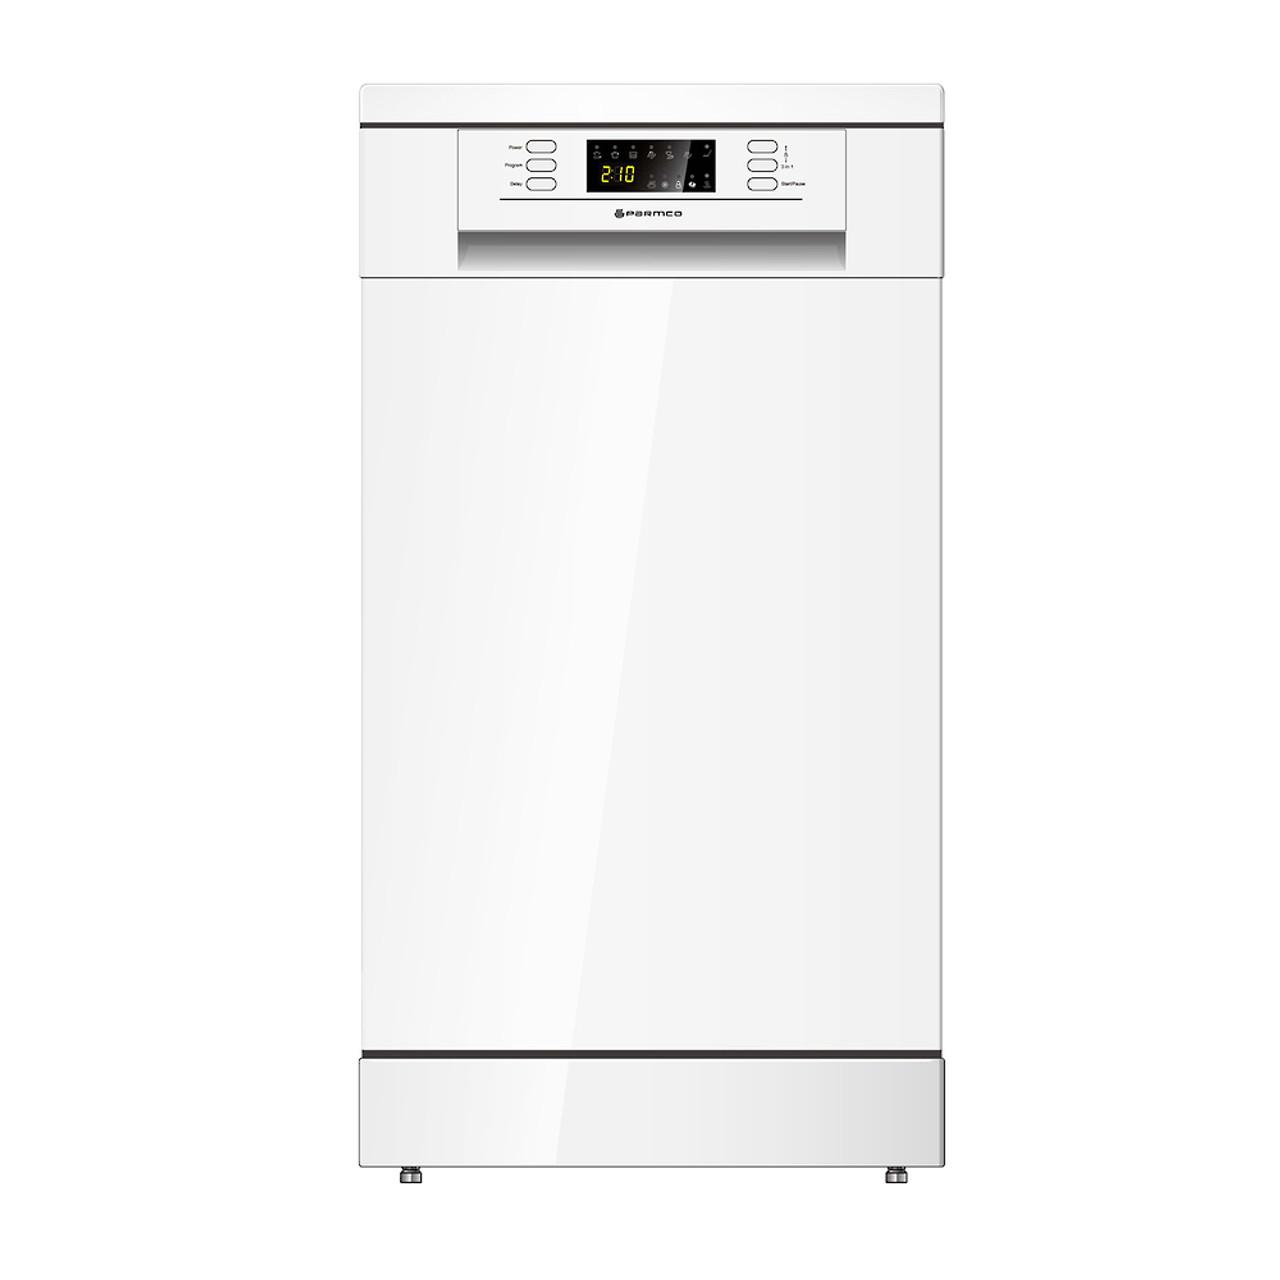 PARMCO 450mm Freestanding Dishwasher, Slim, Economy, White